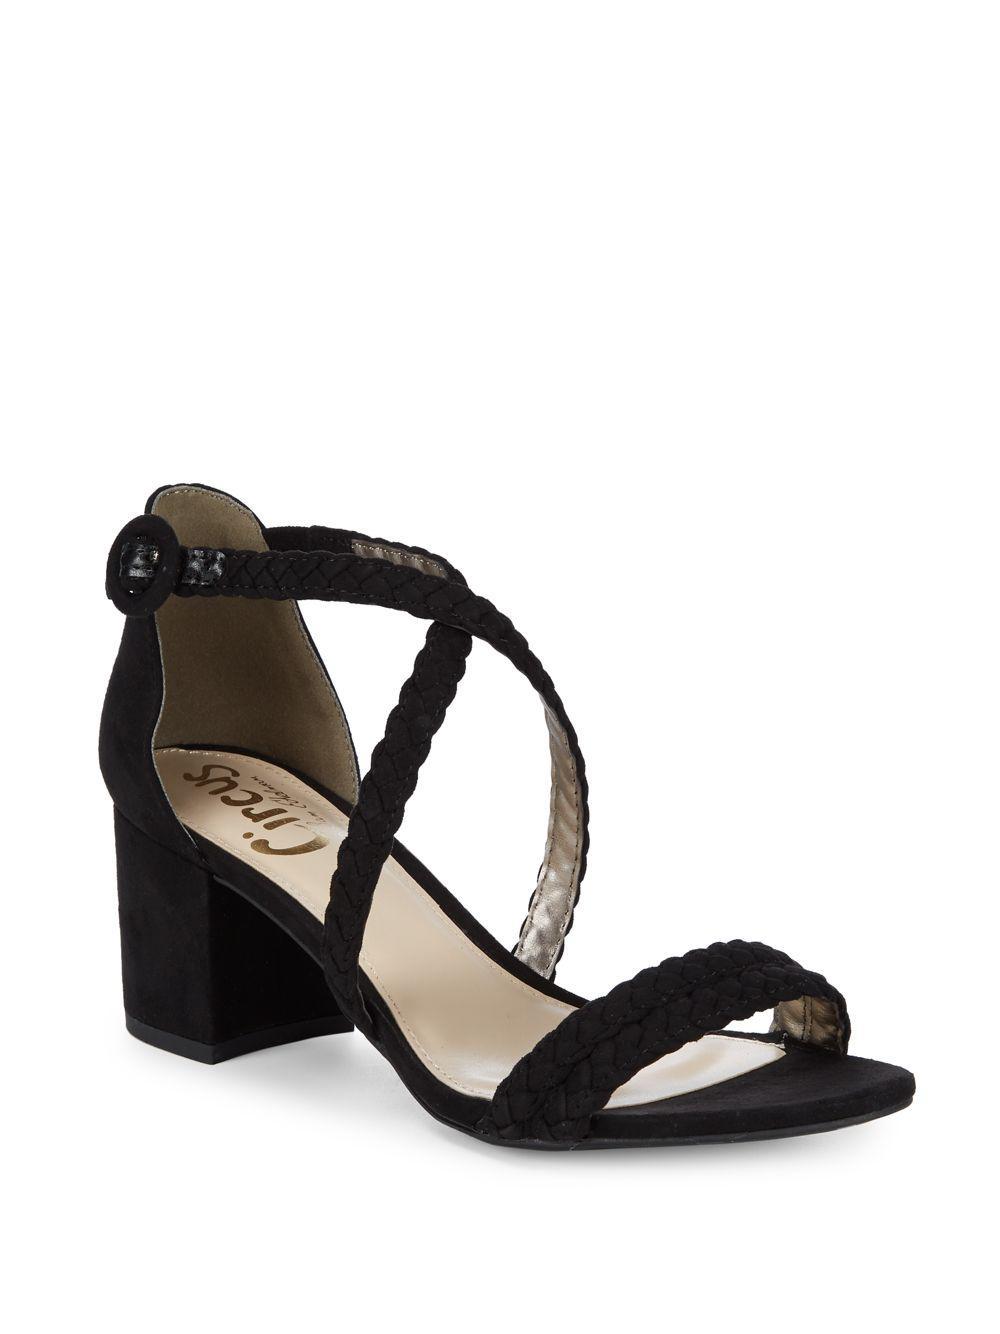 aba8f21e0ab4 Lyst - Circus by Sam Edelman Sallie Braided Block-heel Sandals in Black